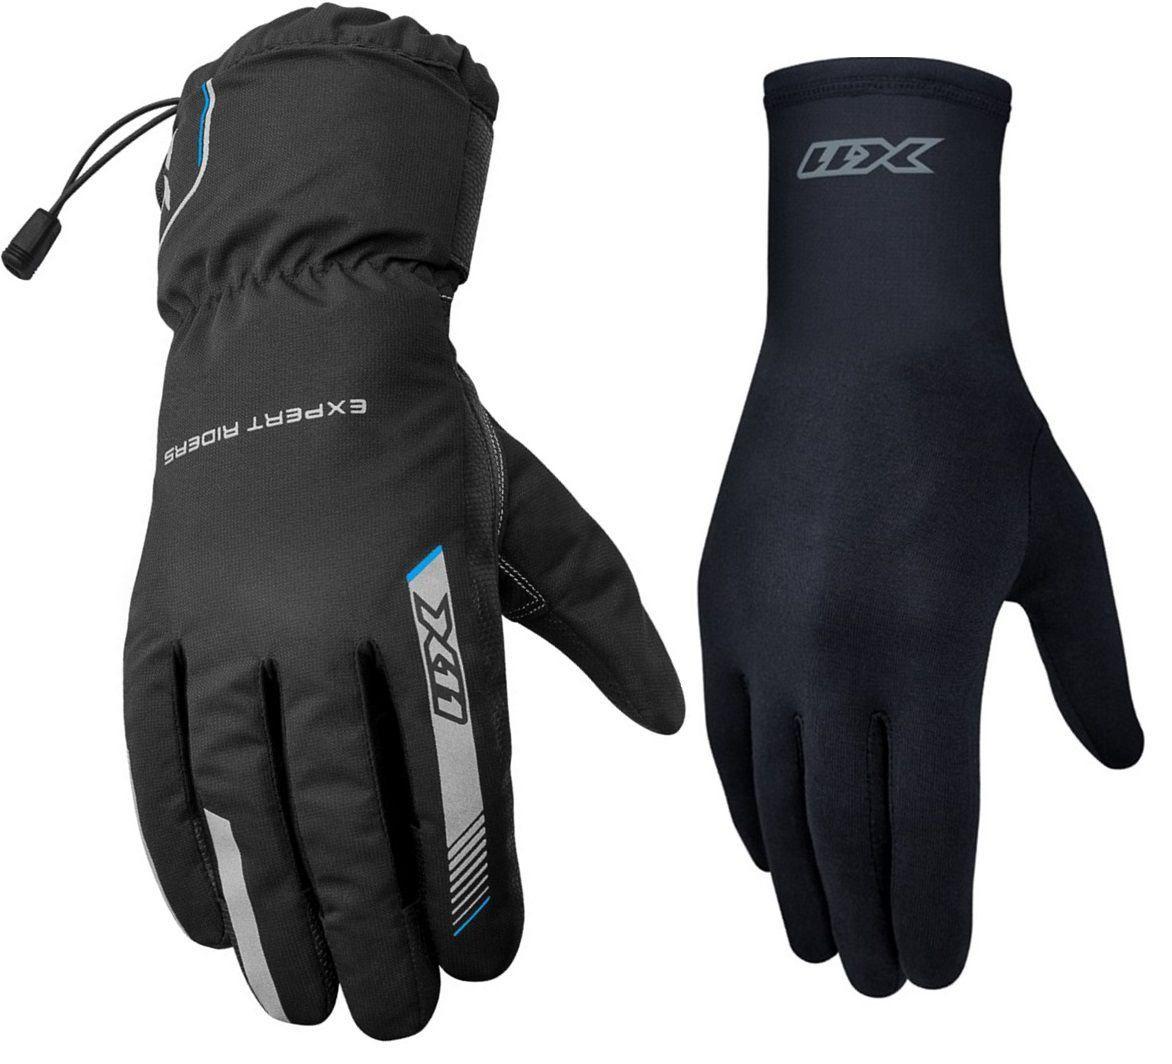 Kit Luva X11 Proof Impermeável Motociclista + Luva X11 Thermic Segunda Pele Motoqueiro